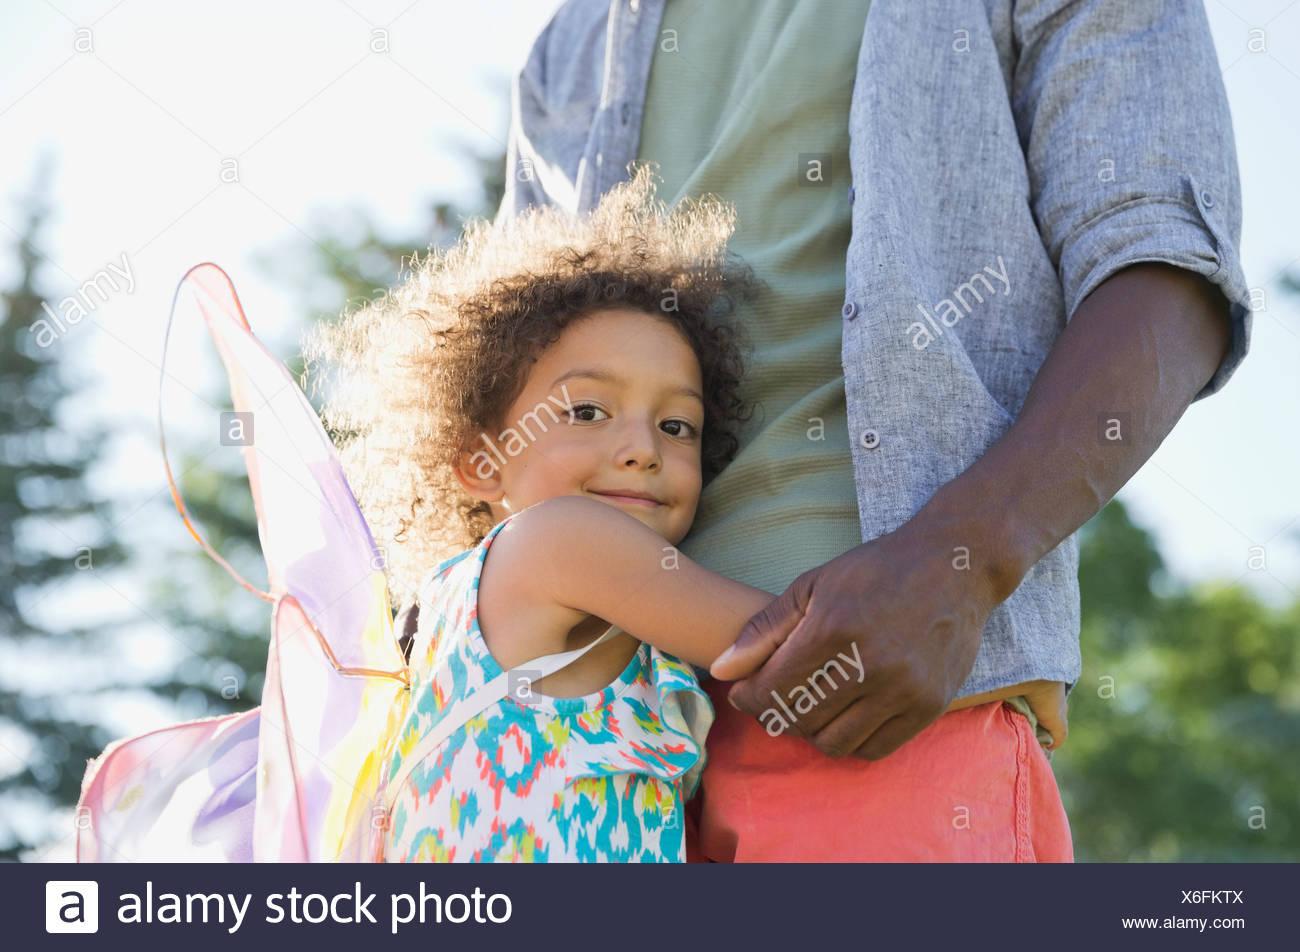 Portrait of cute girl embracing père at park Photo Stock